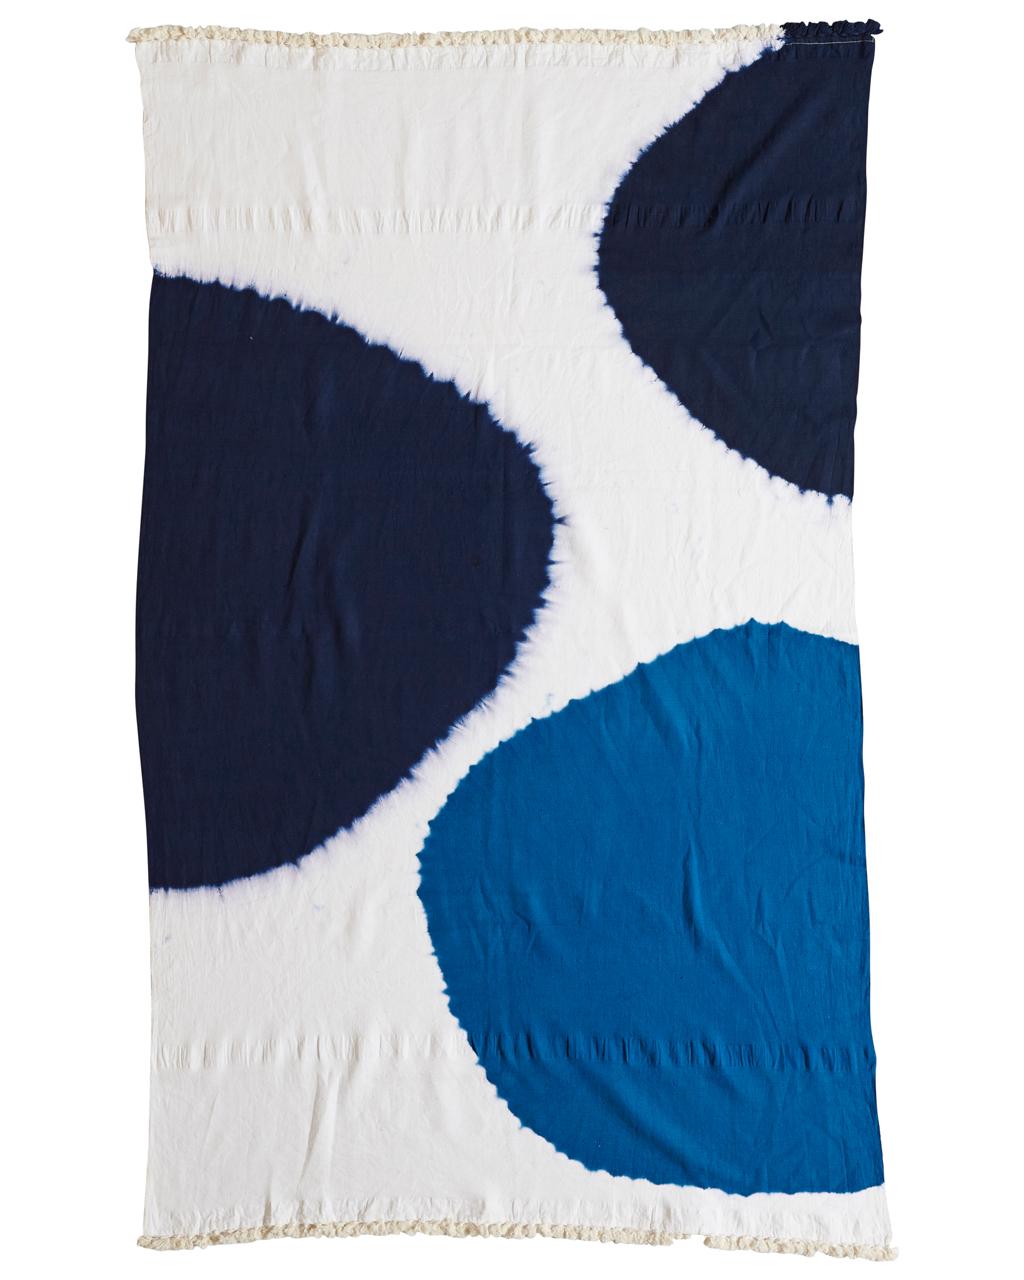 Jac+ Jack + Dinosaur Designs Moons Beach Towel Flat LR.jpg